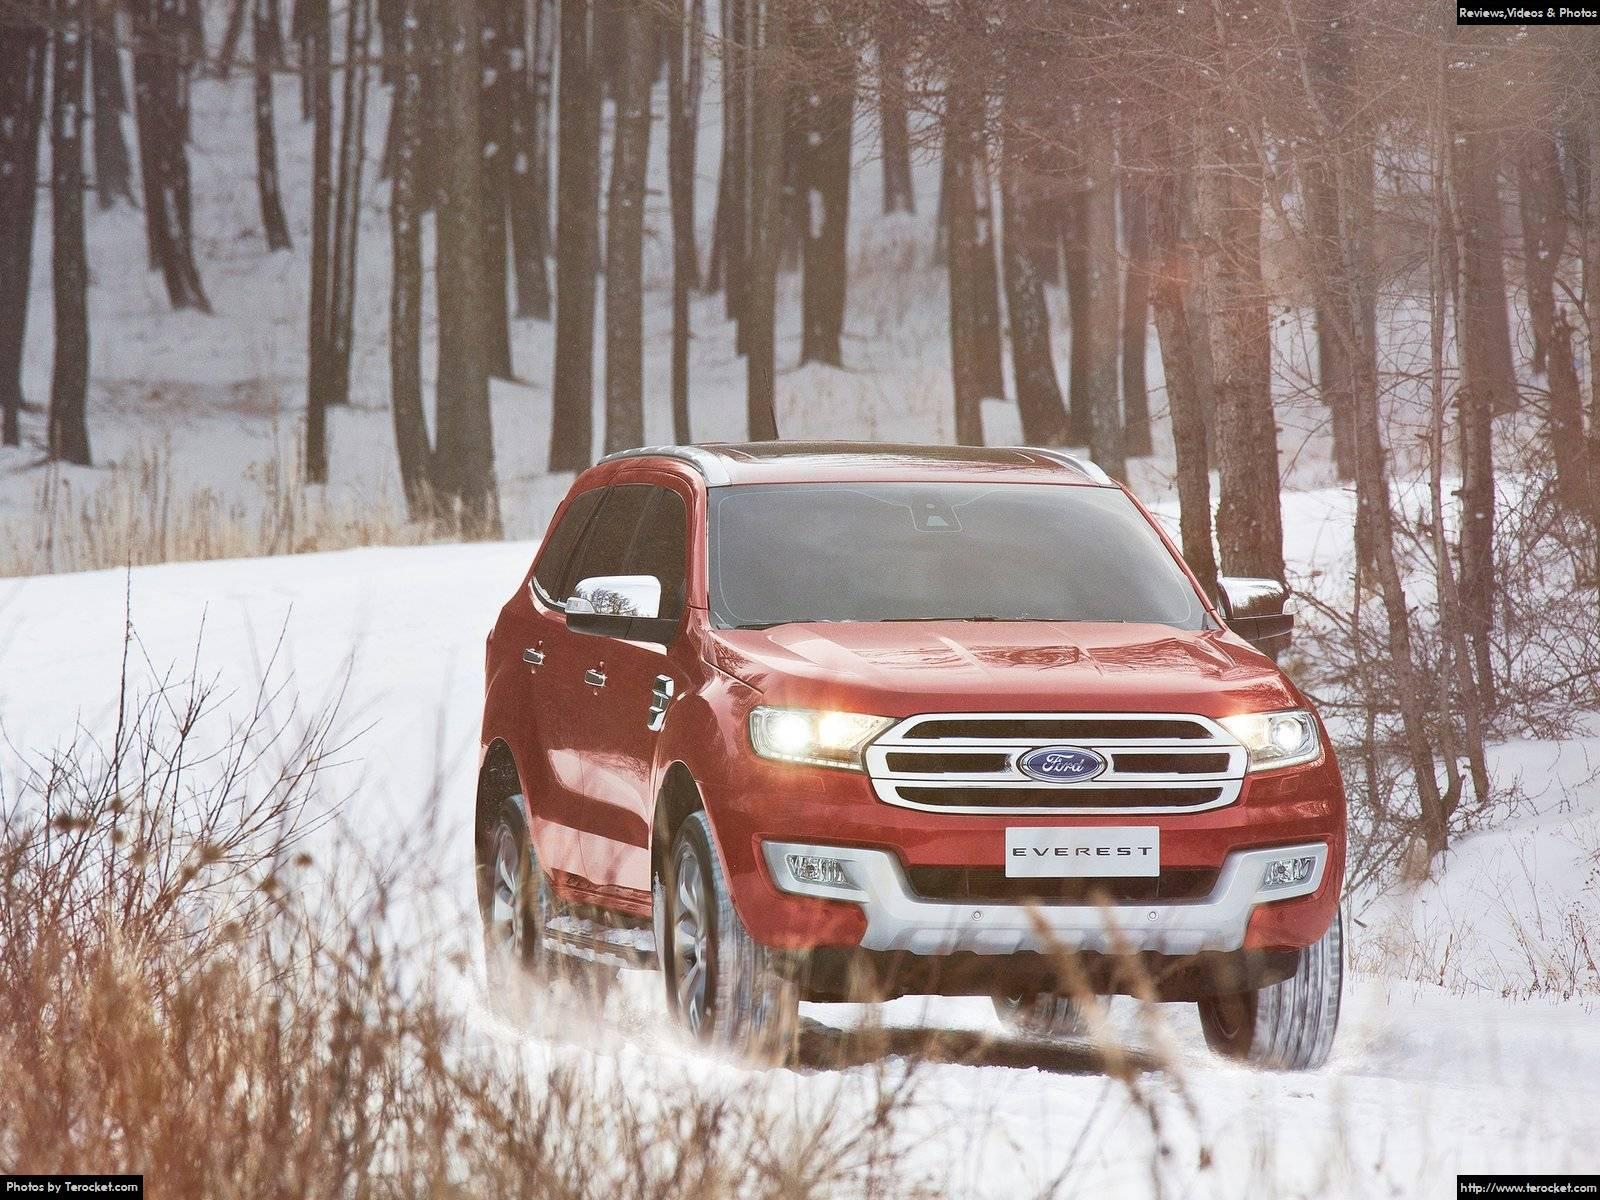 Đánh giá xe Ford Everest 2016 & giá xe